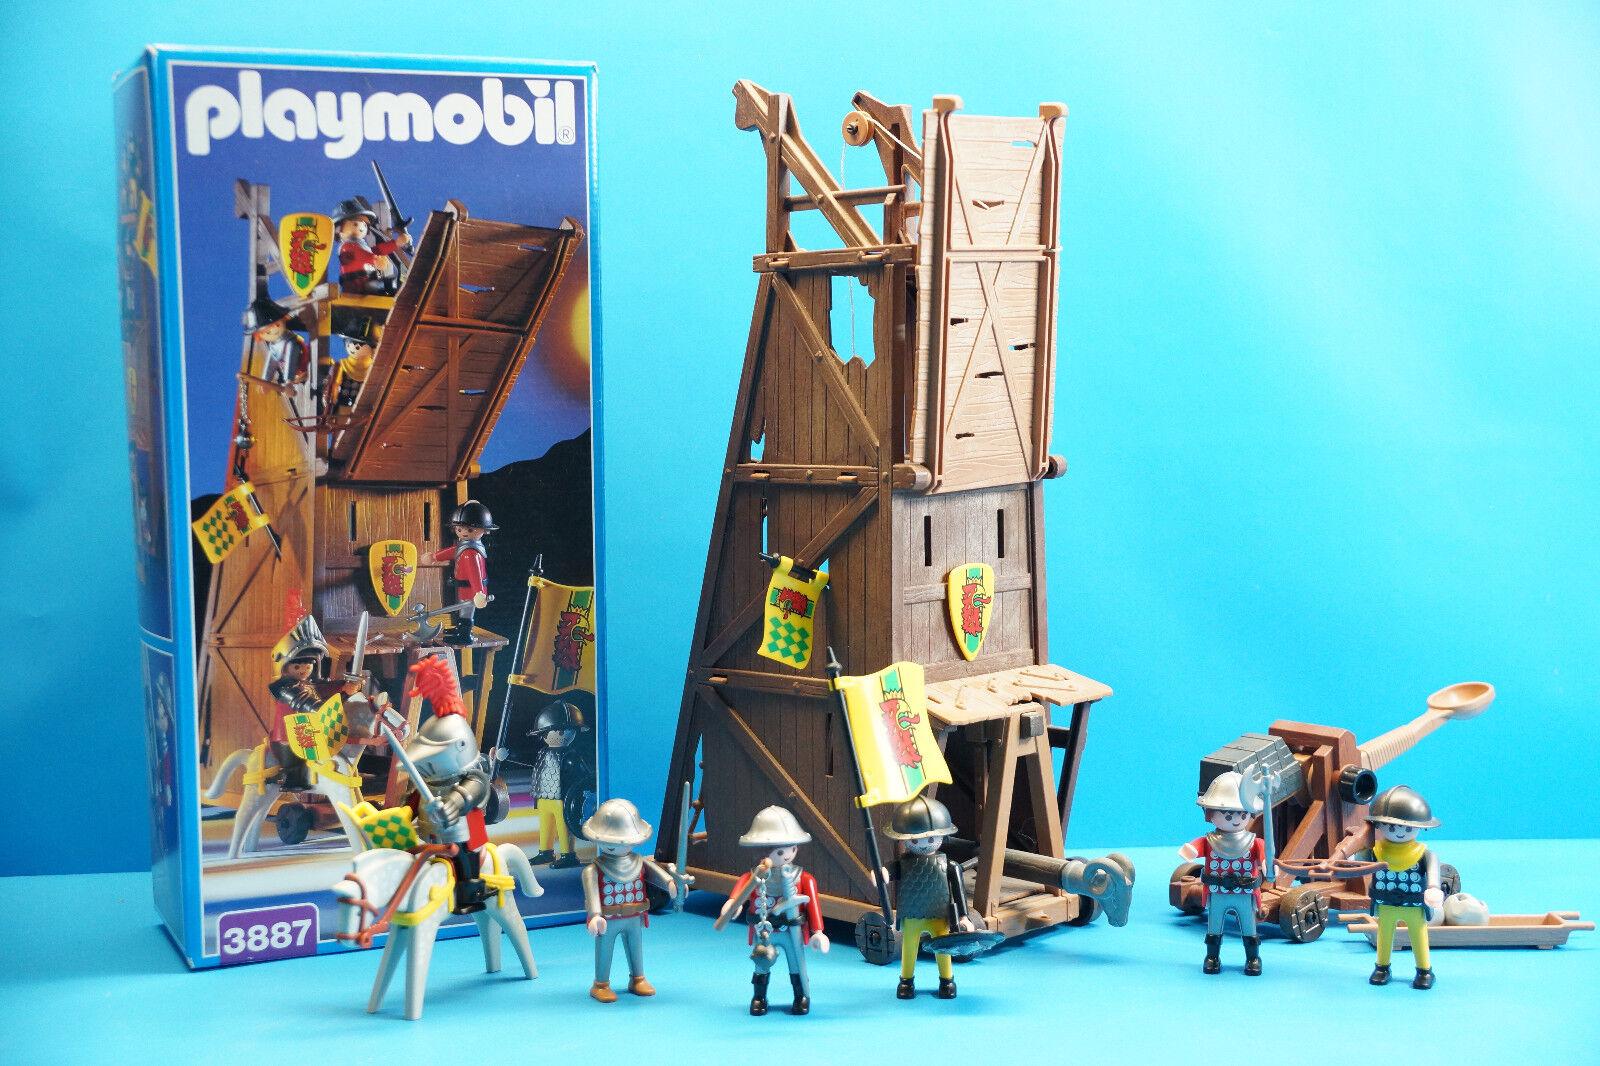 Playmobil Angriffsturm - Belangerungsturmmit OVP (3887) - J839